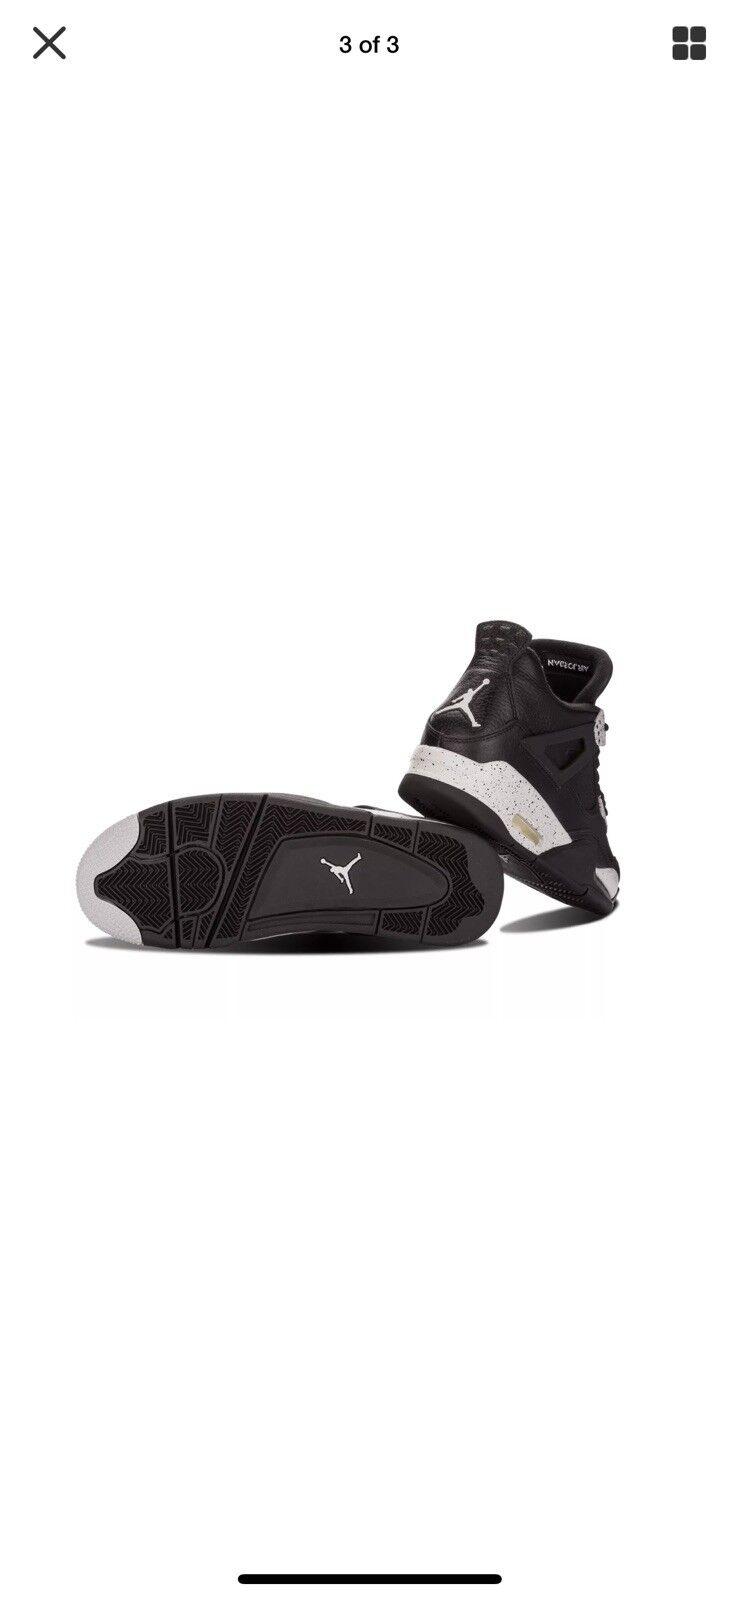 Air Jordan Retro 4 Oreo IV vnds Size 10.5